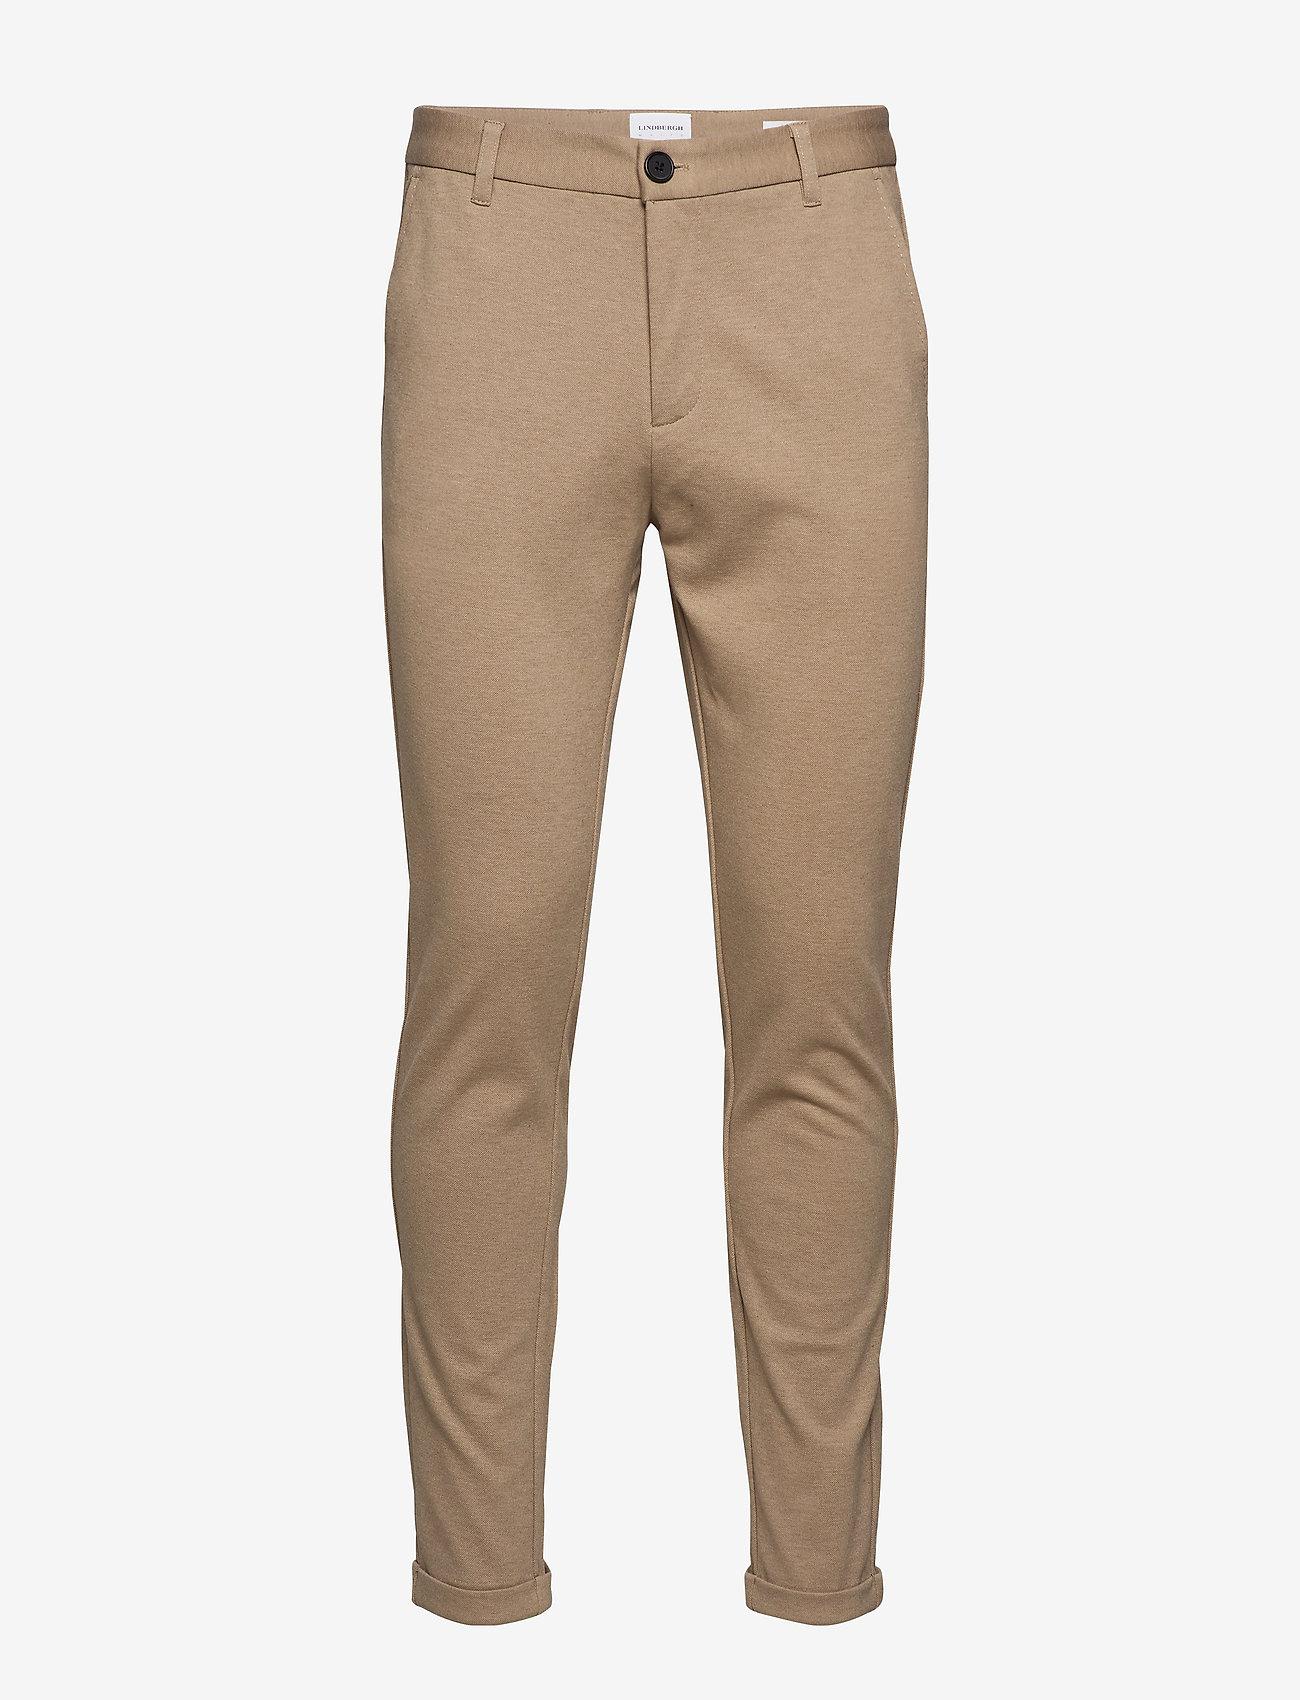 Lindbergh - Knitted pants normal length - spodnie na co dzień - lt sand mix - 0